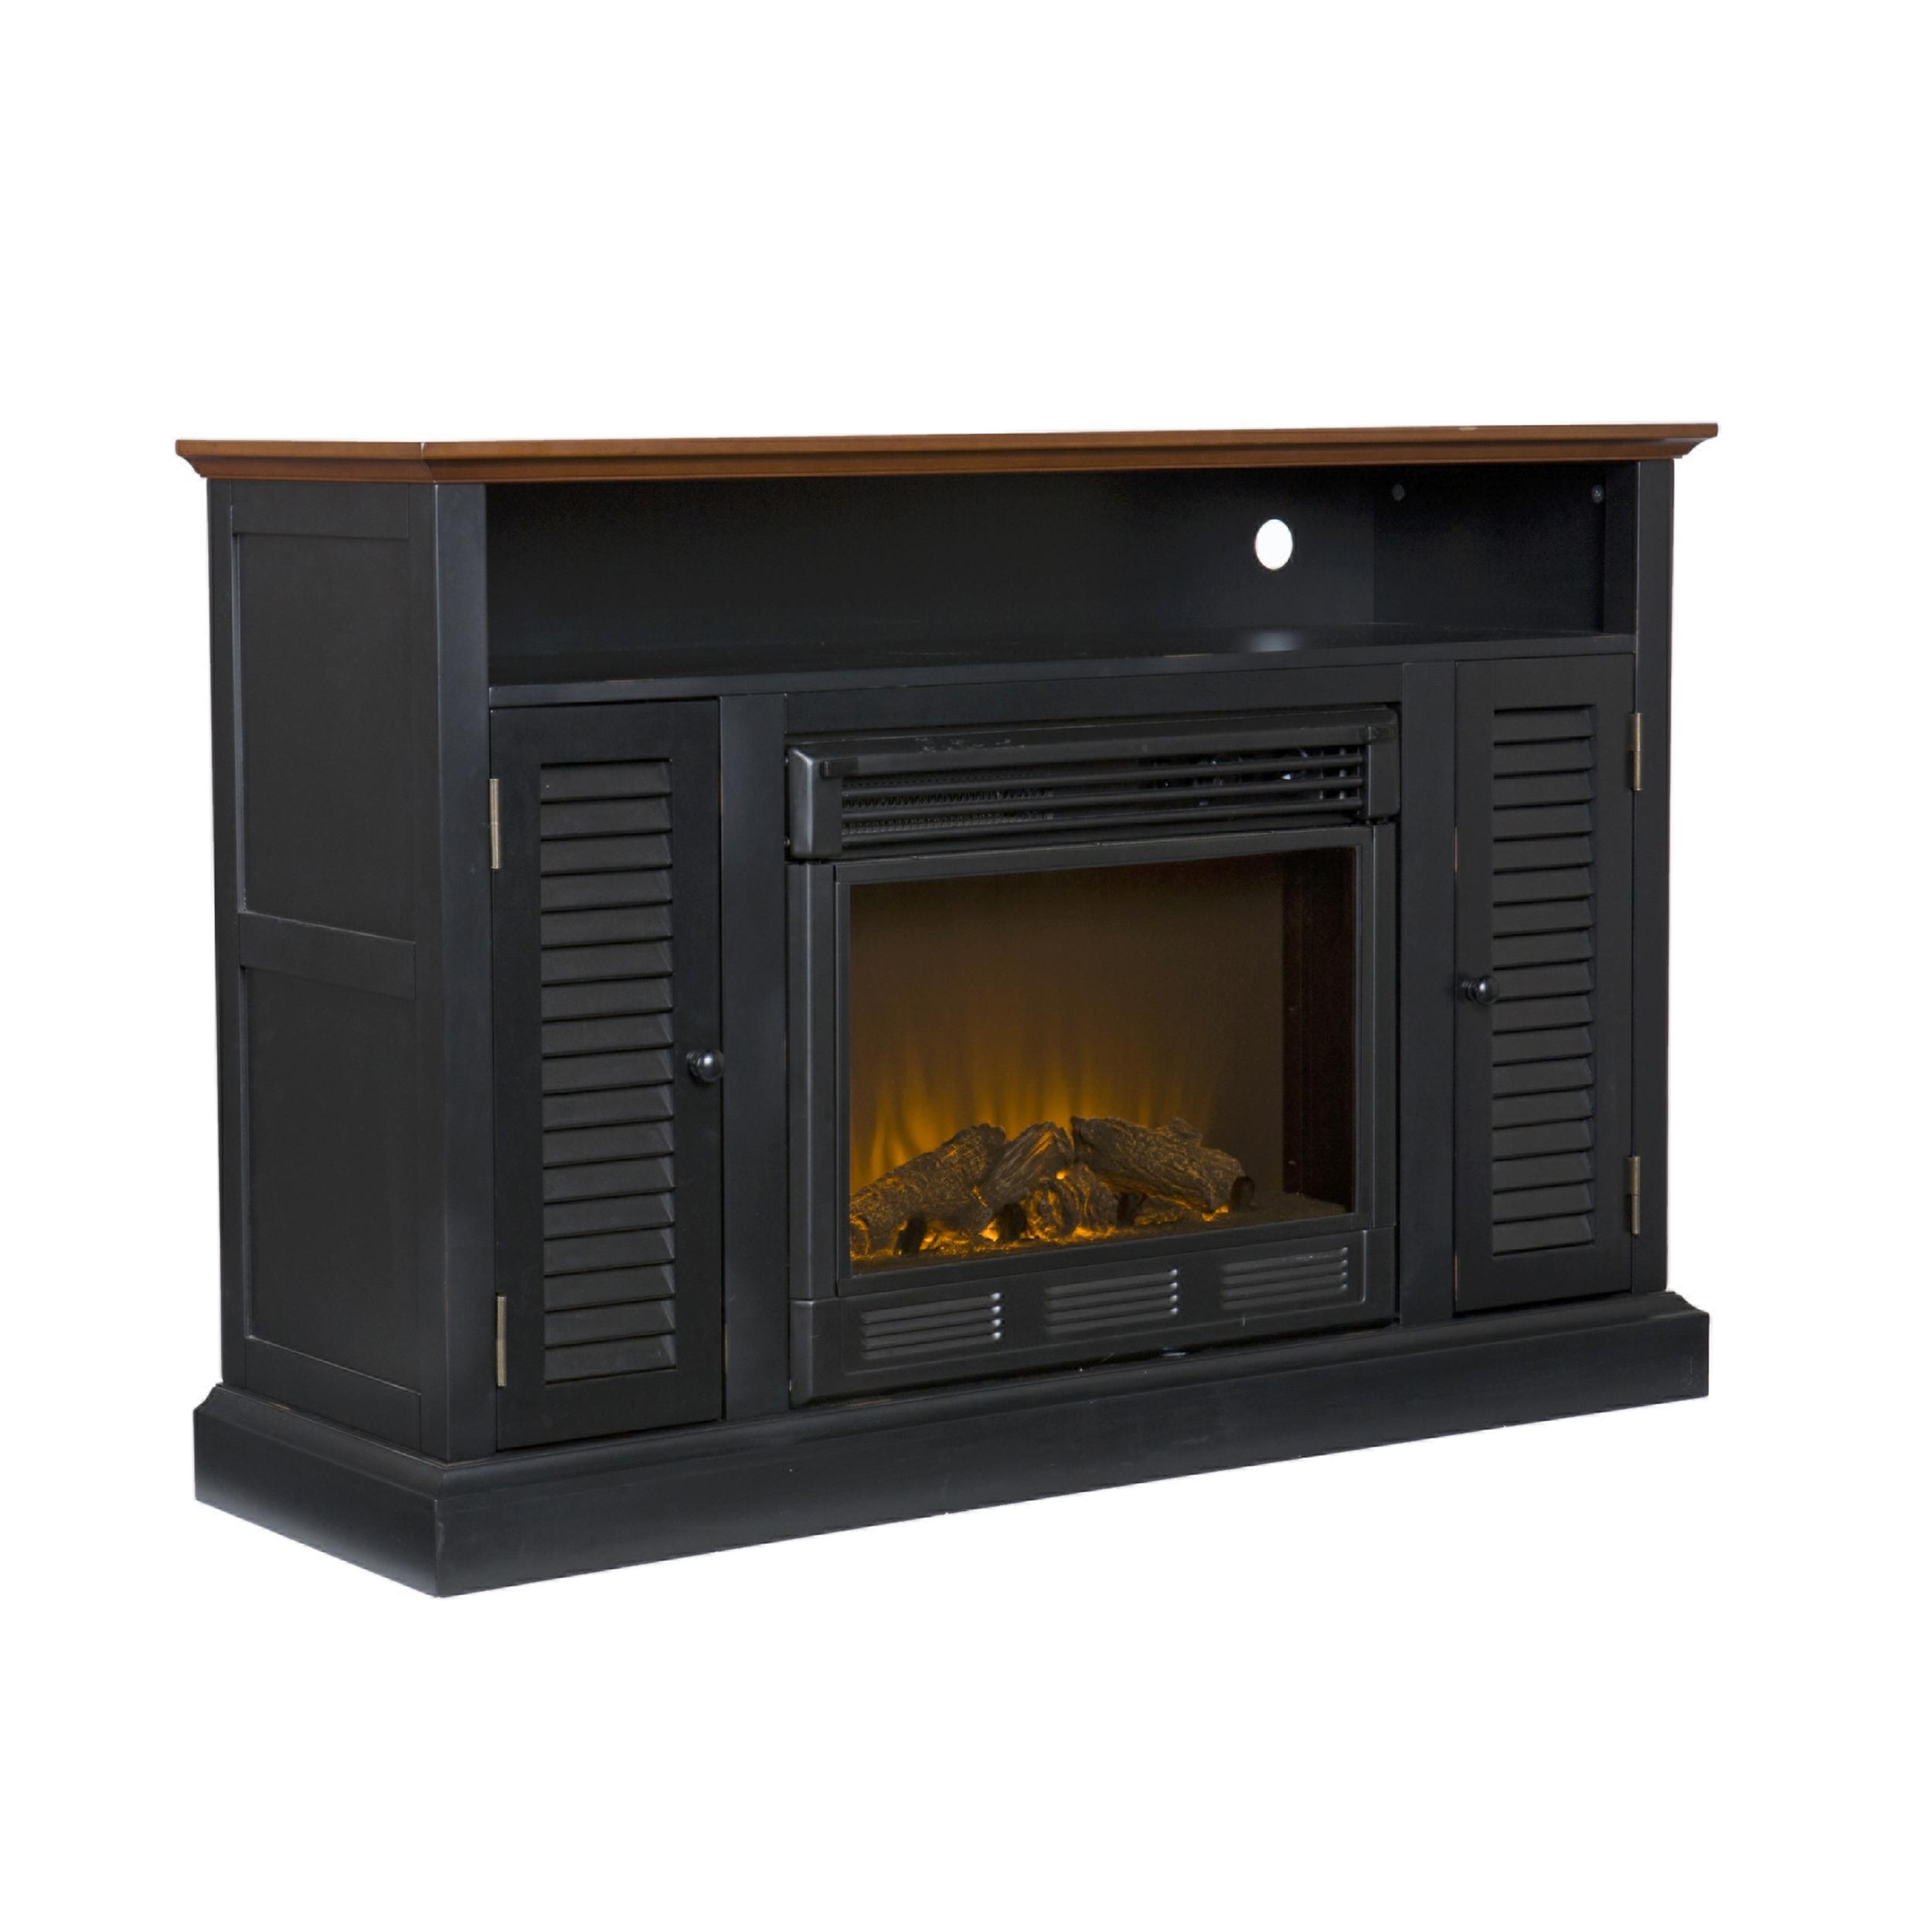 Amazoncom  SEI Antebellum Media Console with Electric Fireplace Antique White  Media